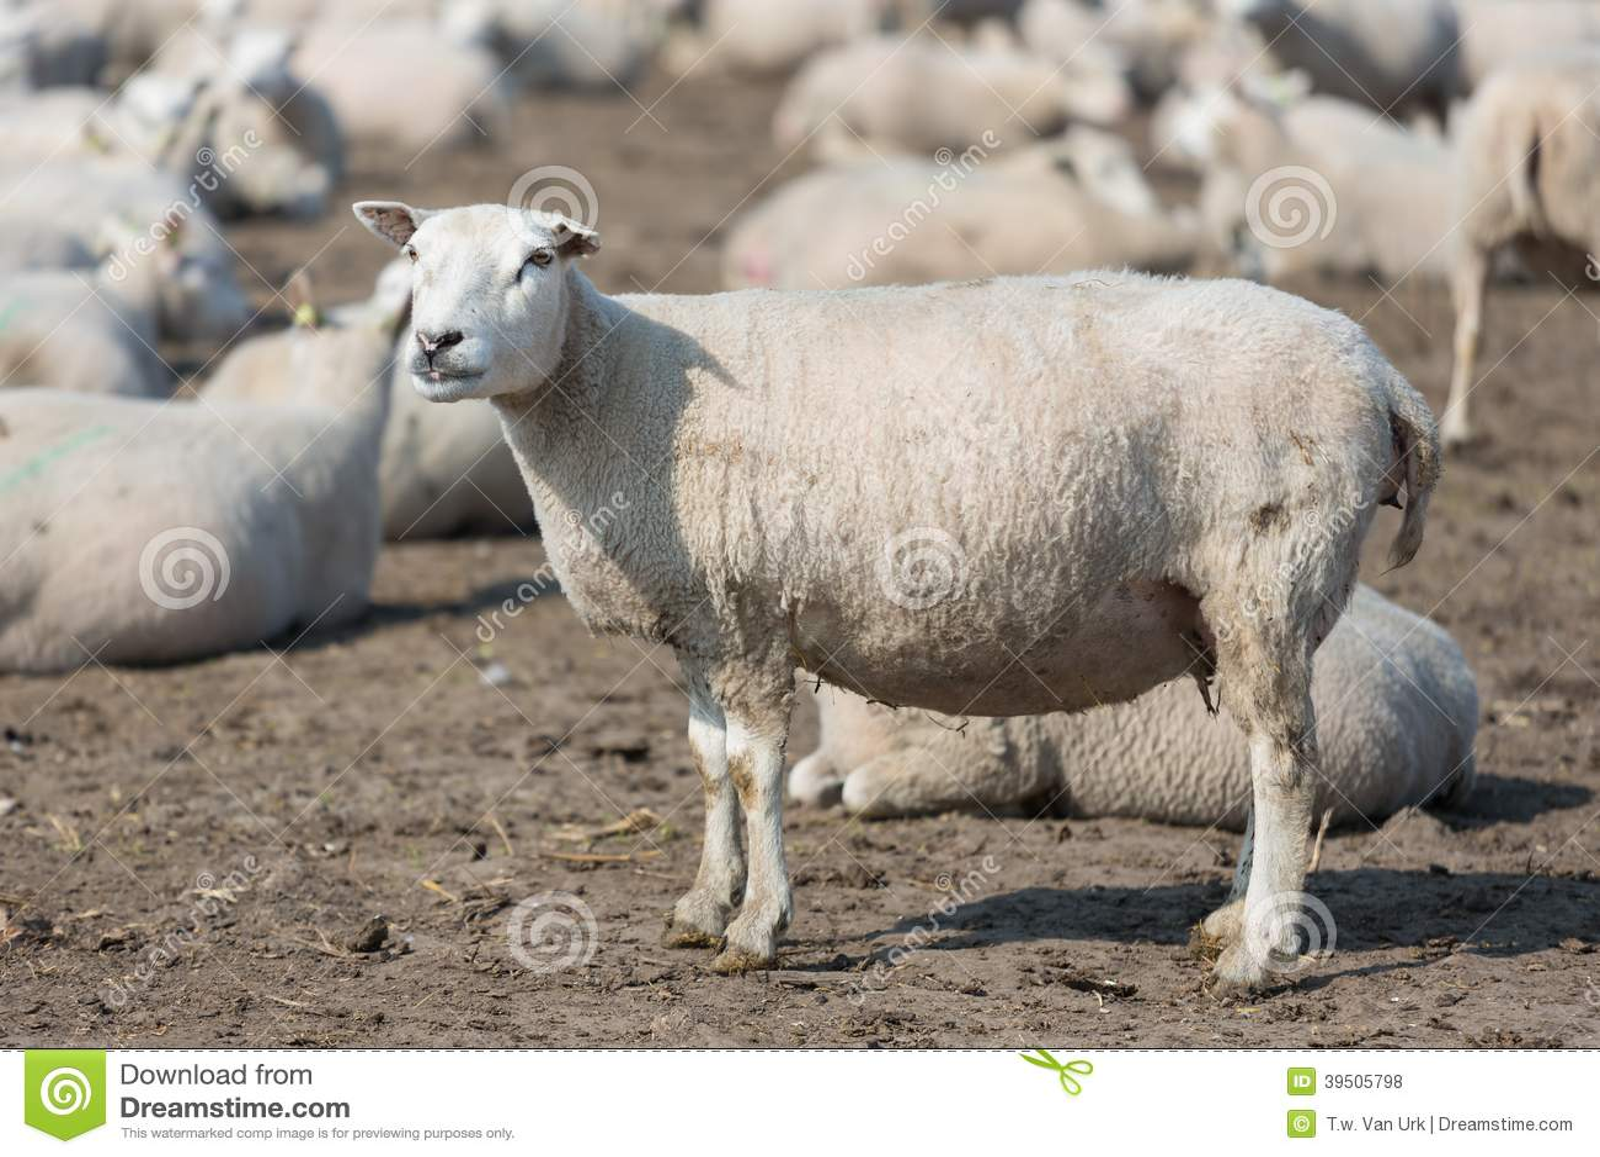 Pregnant sheep in Dutch countryside